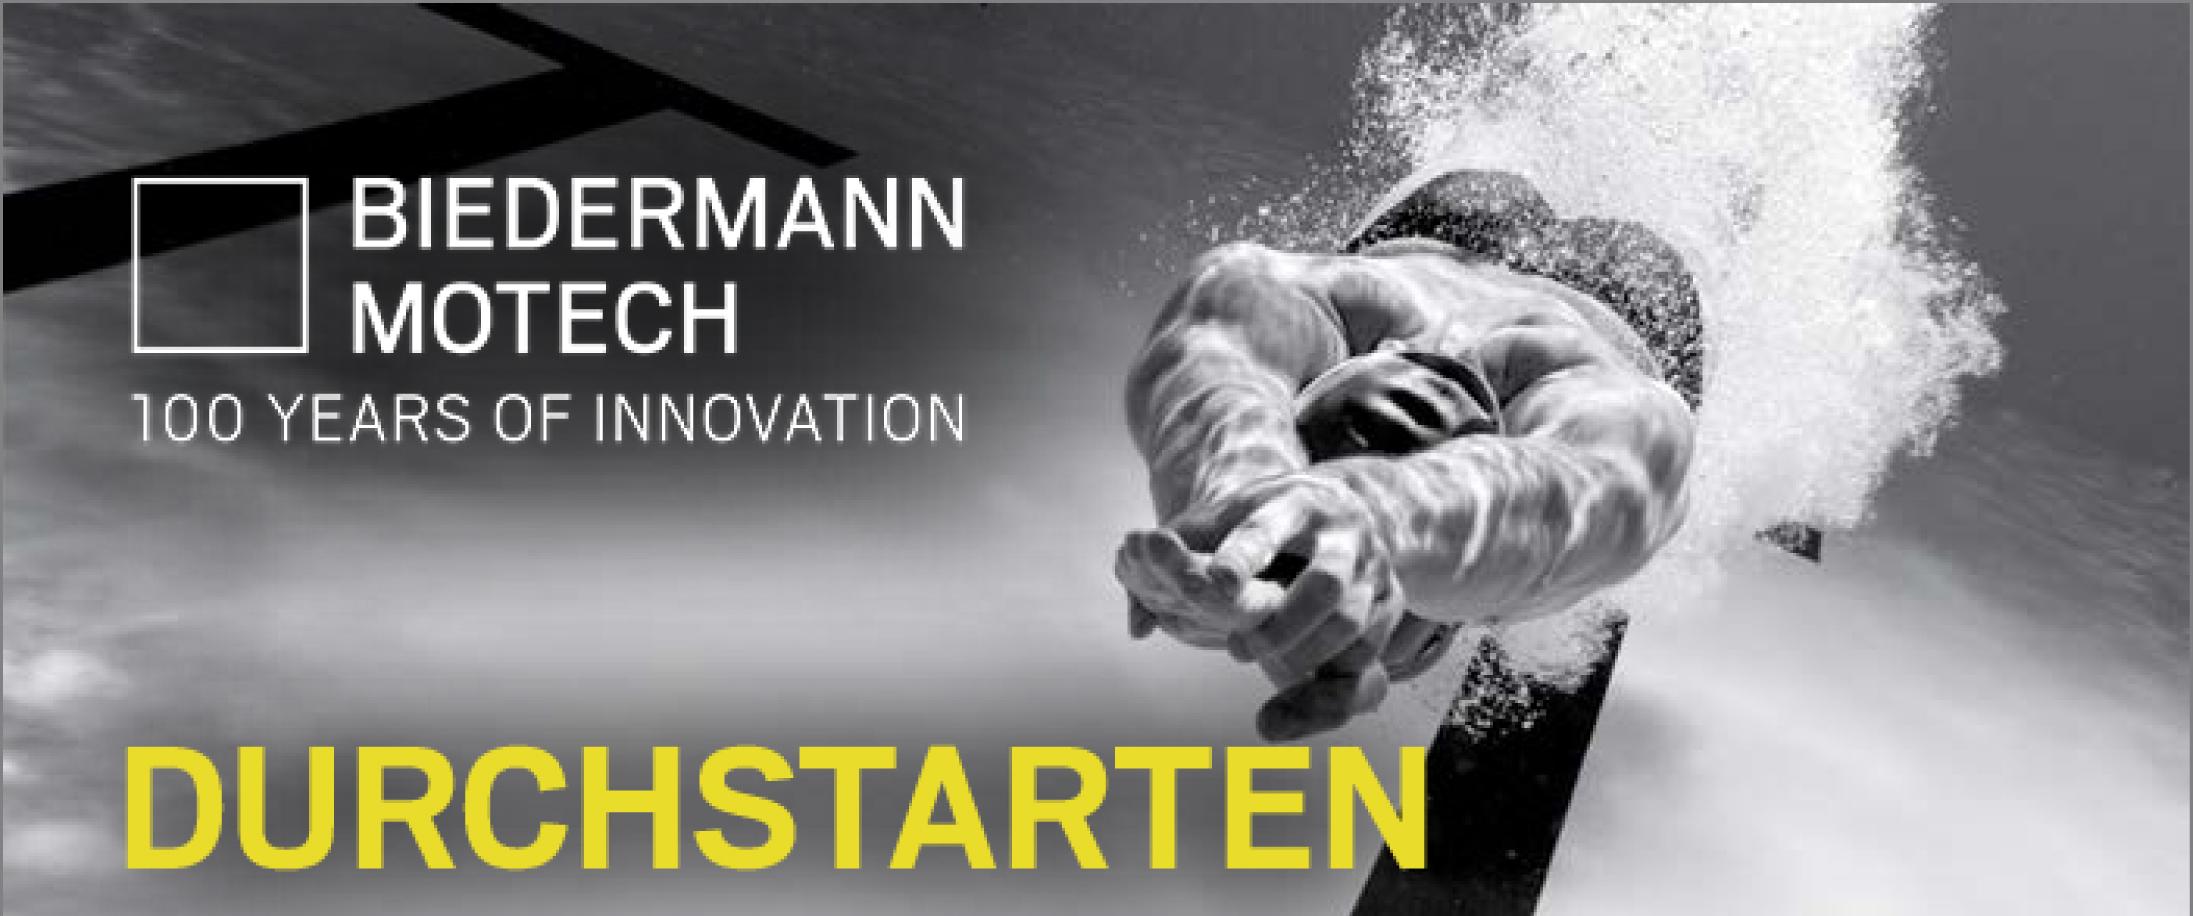 Biedermann_Customer Service